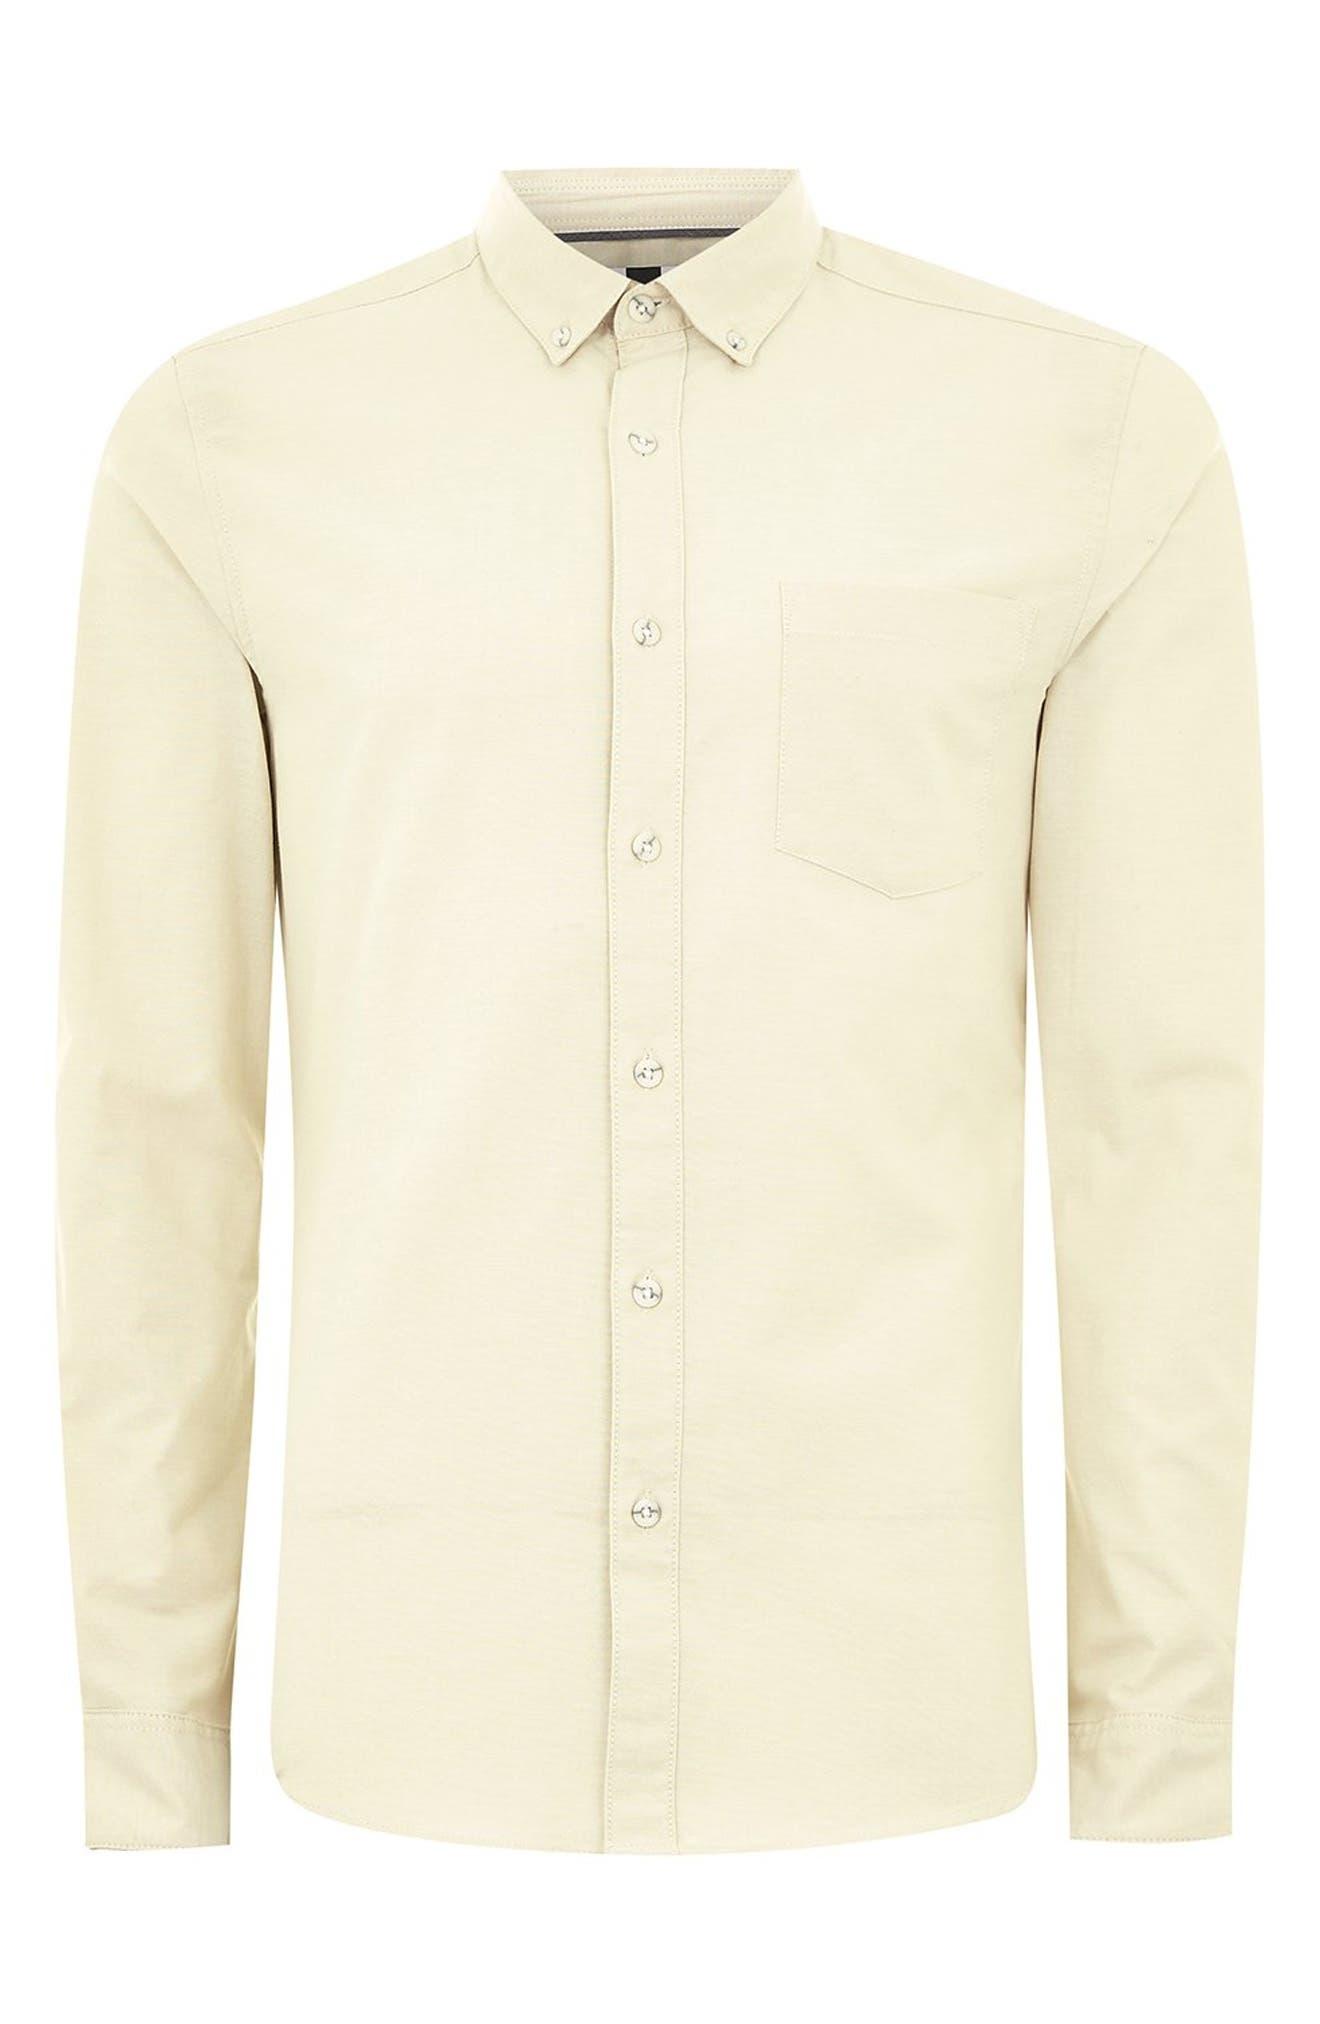 TOPMAN,                             Muscle Fit Stripe Oxford Shirt,                             Alternate thumbnail 4, color,                             250